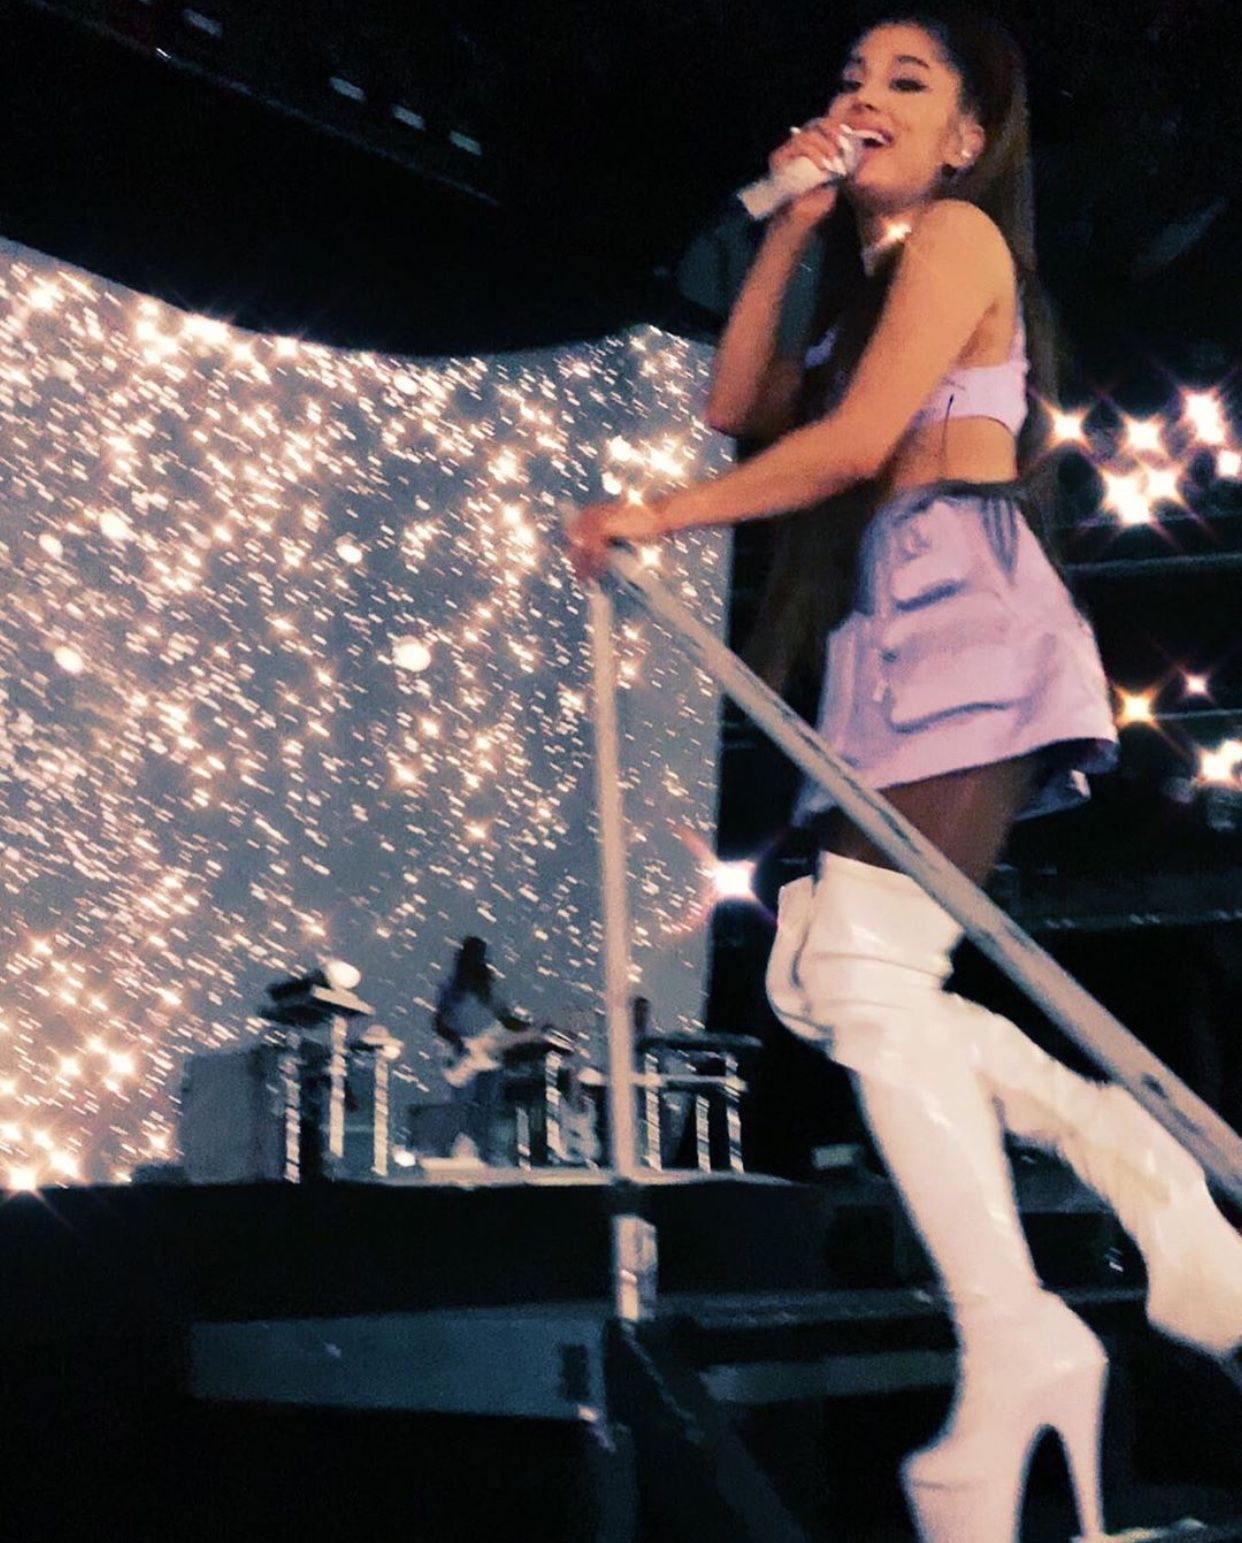 Shes So Pretty Sheesh Ariana Grande Photos Ariana Grande